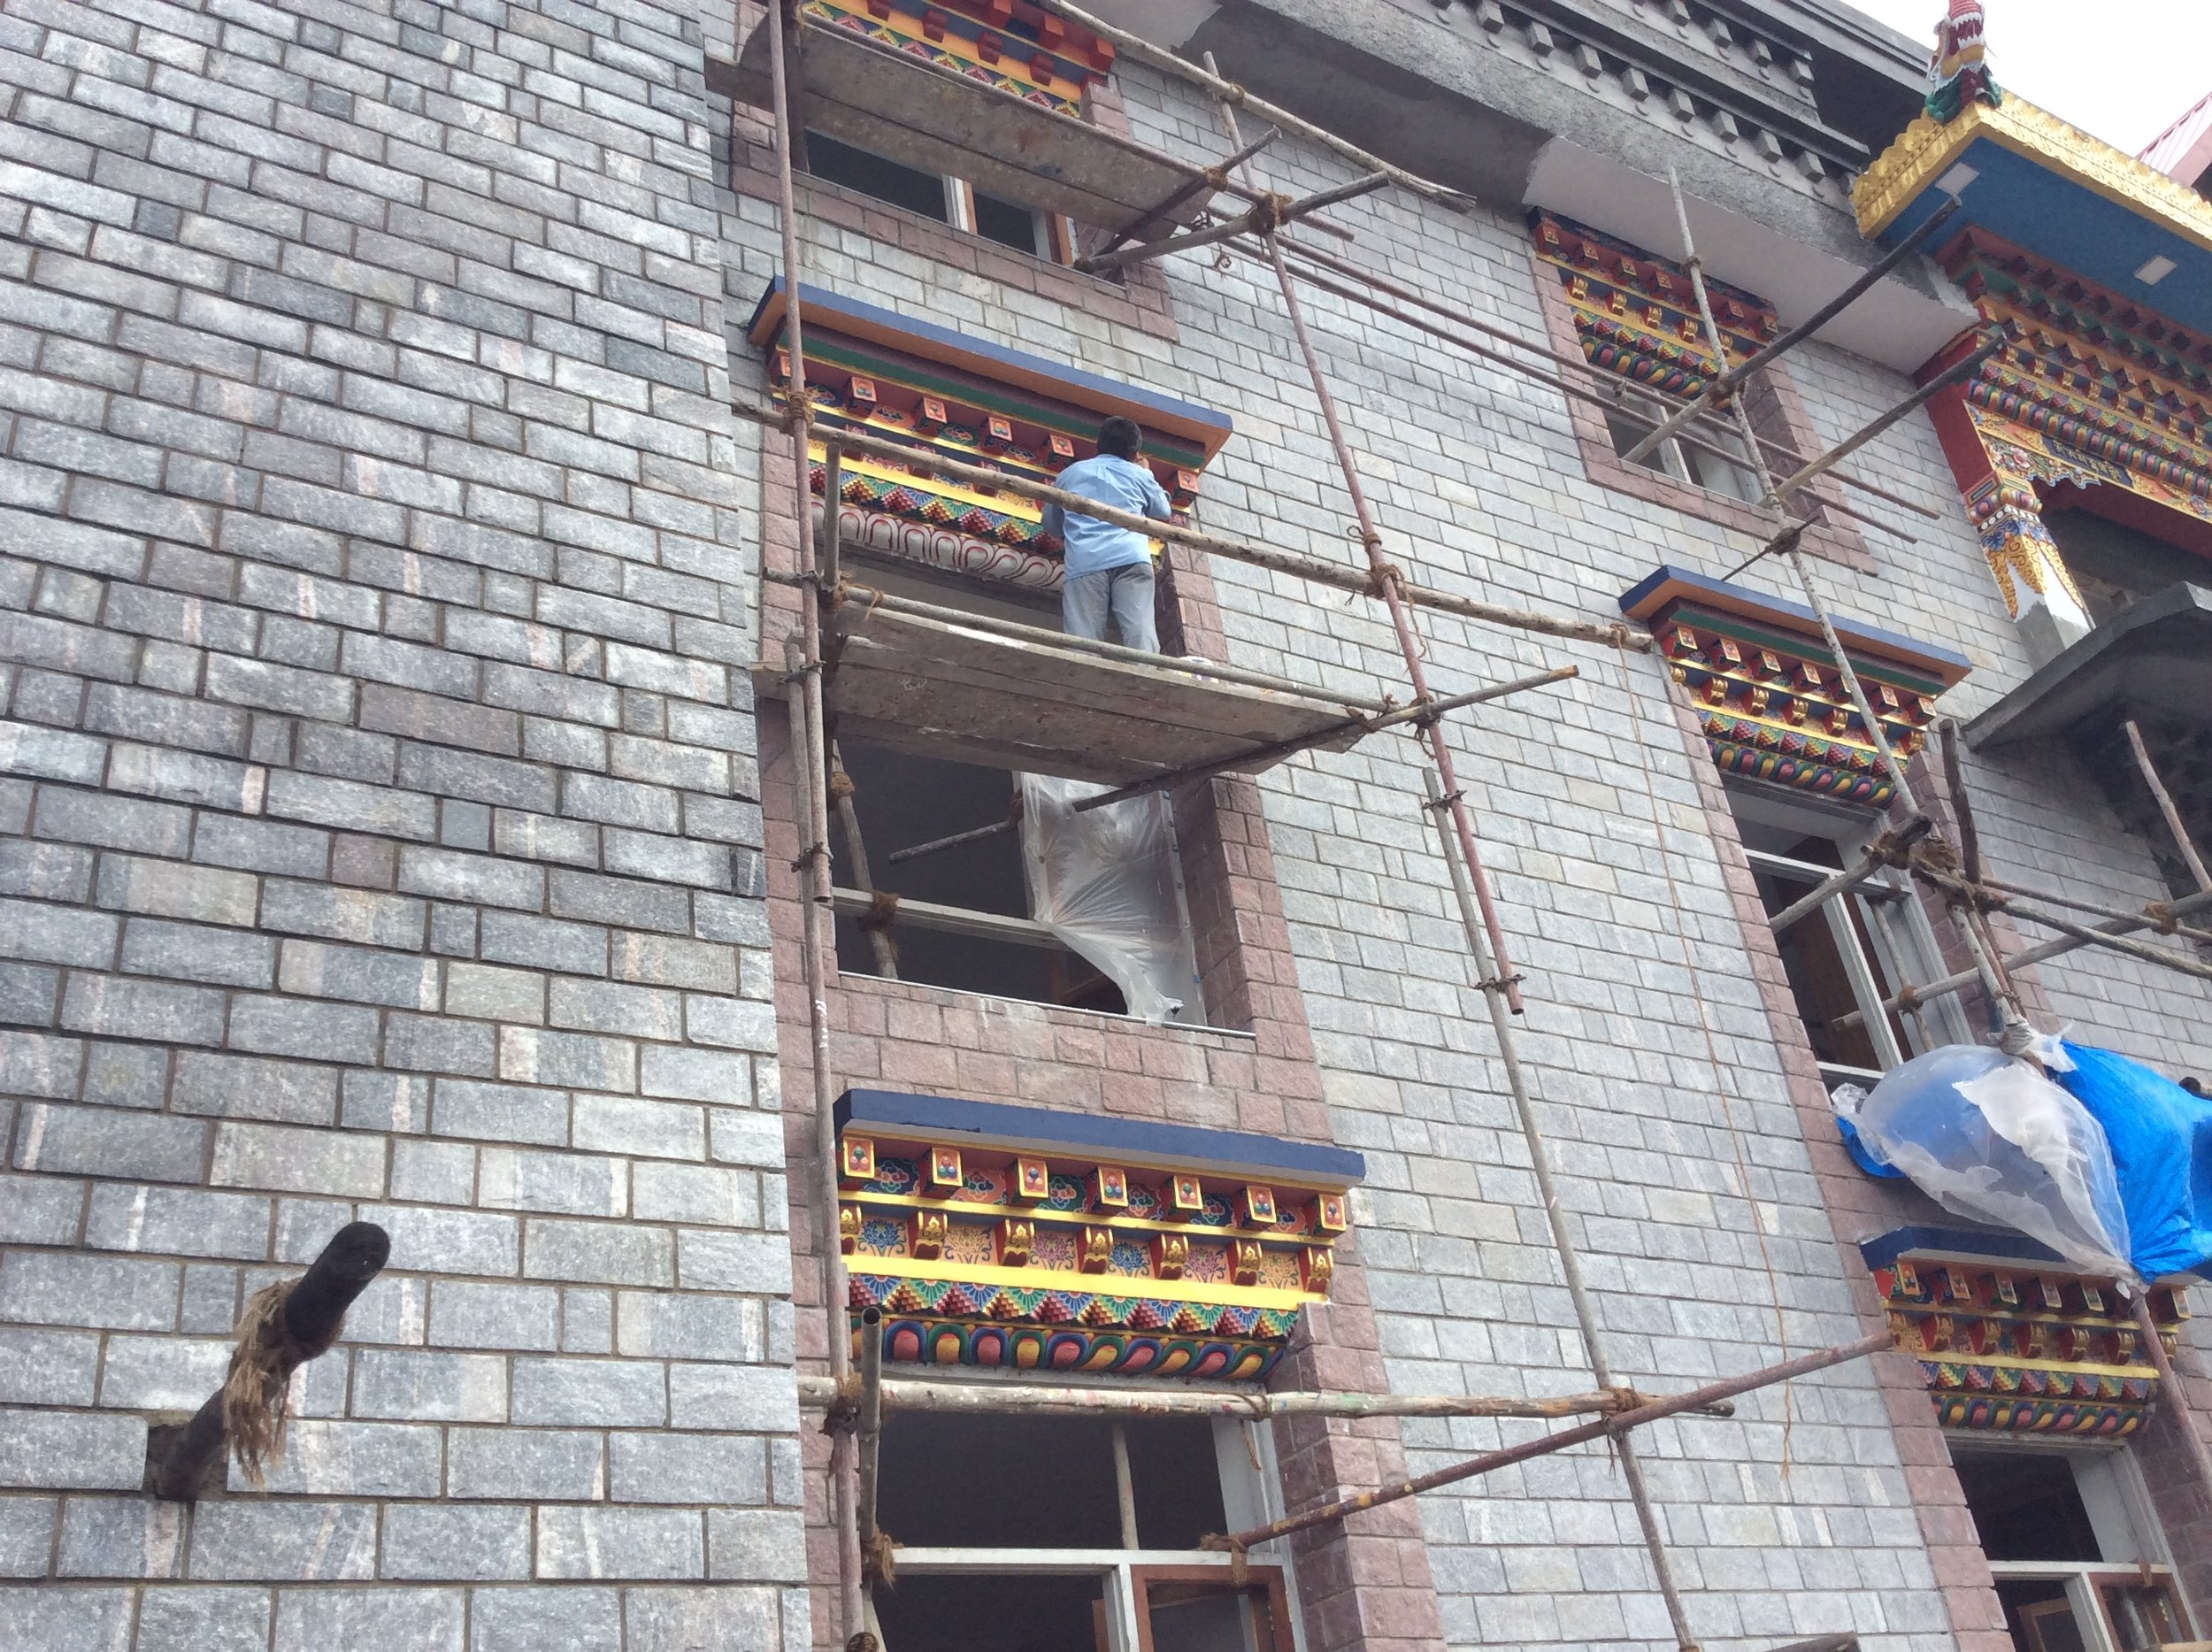 TaLhun Library Work scaffold Aug 2018.jpeg